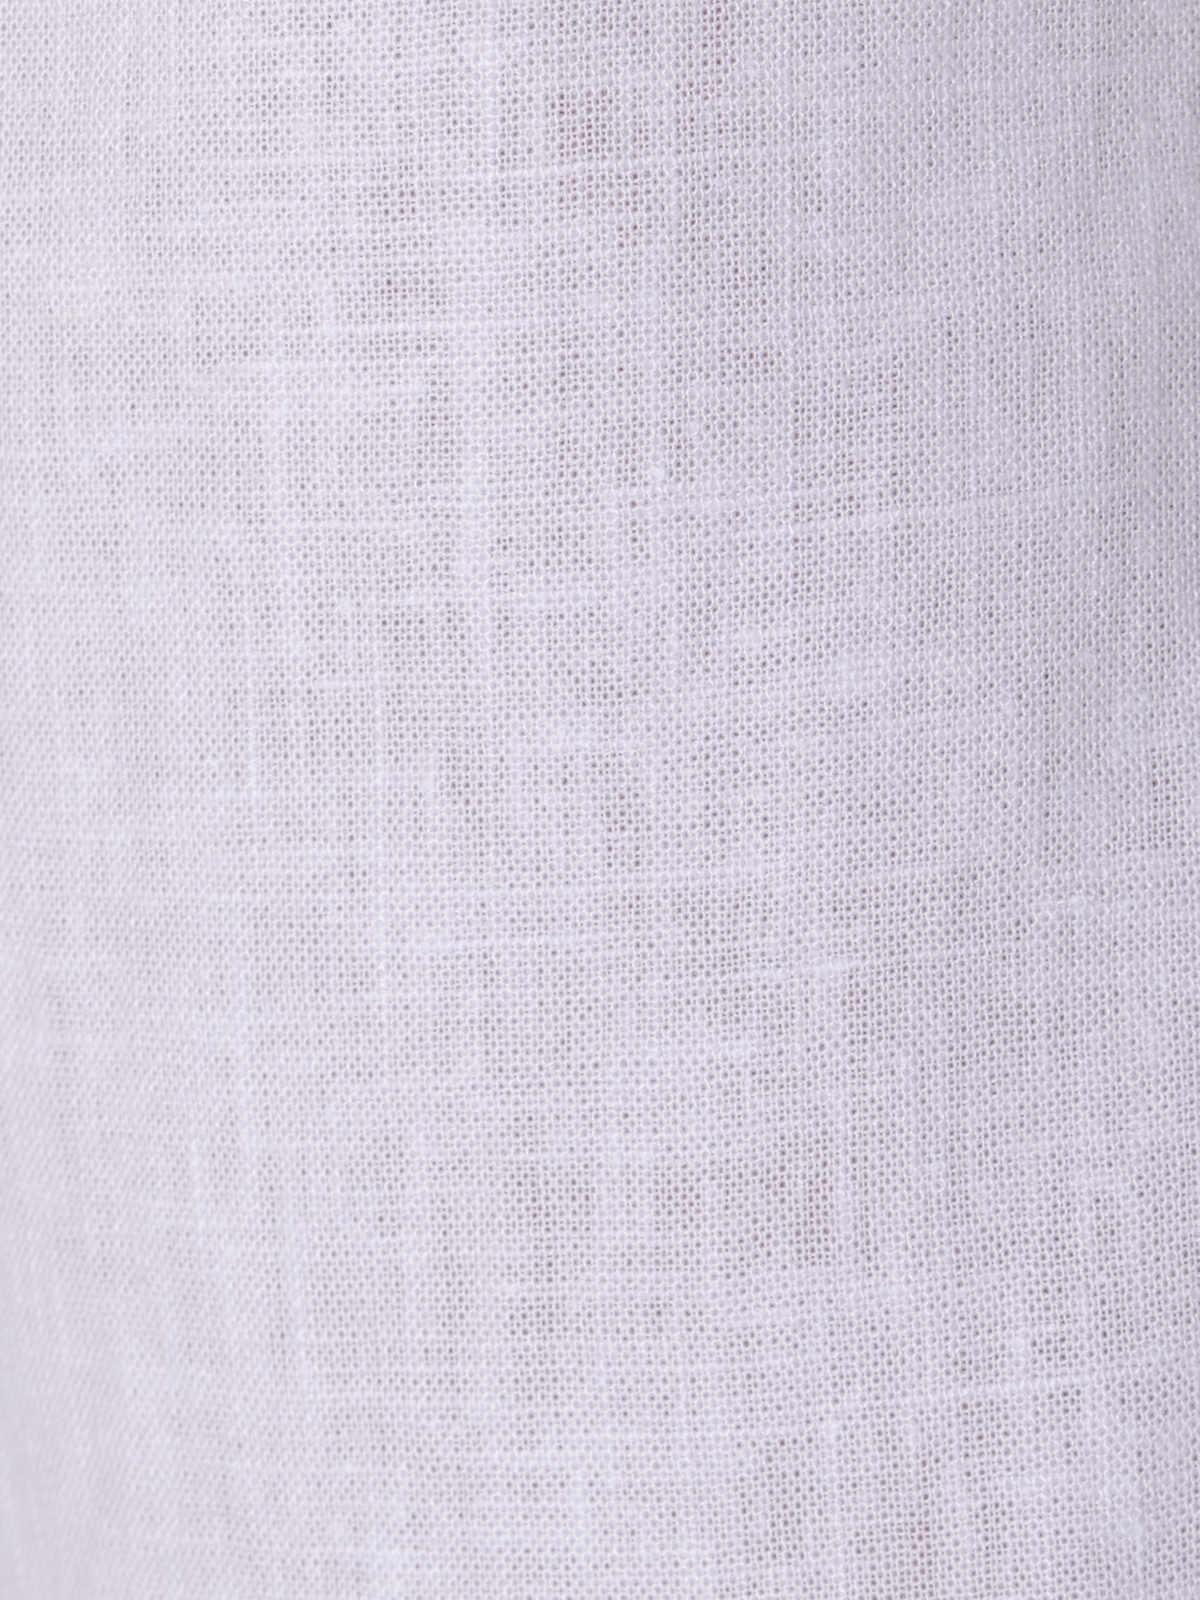 Pantalón de lino mujer oversize Blanco